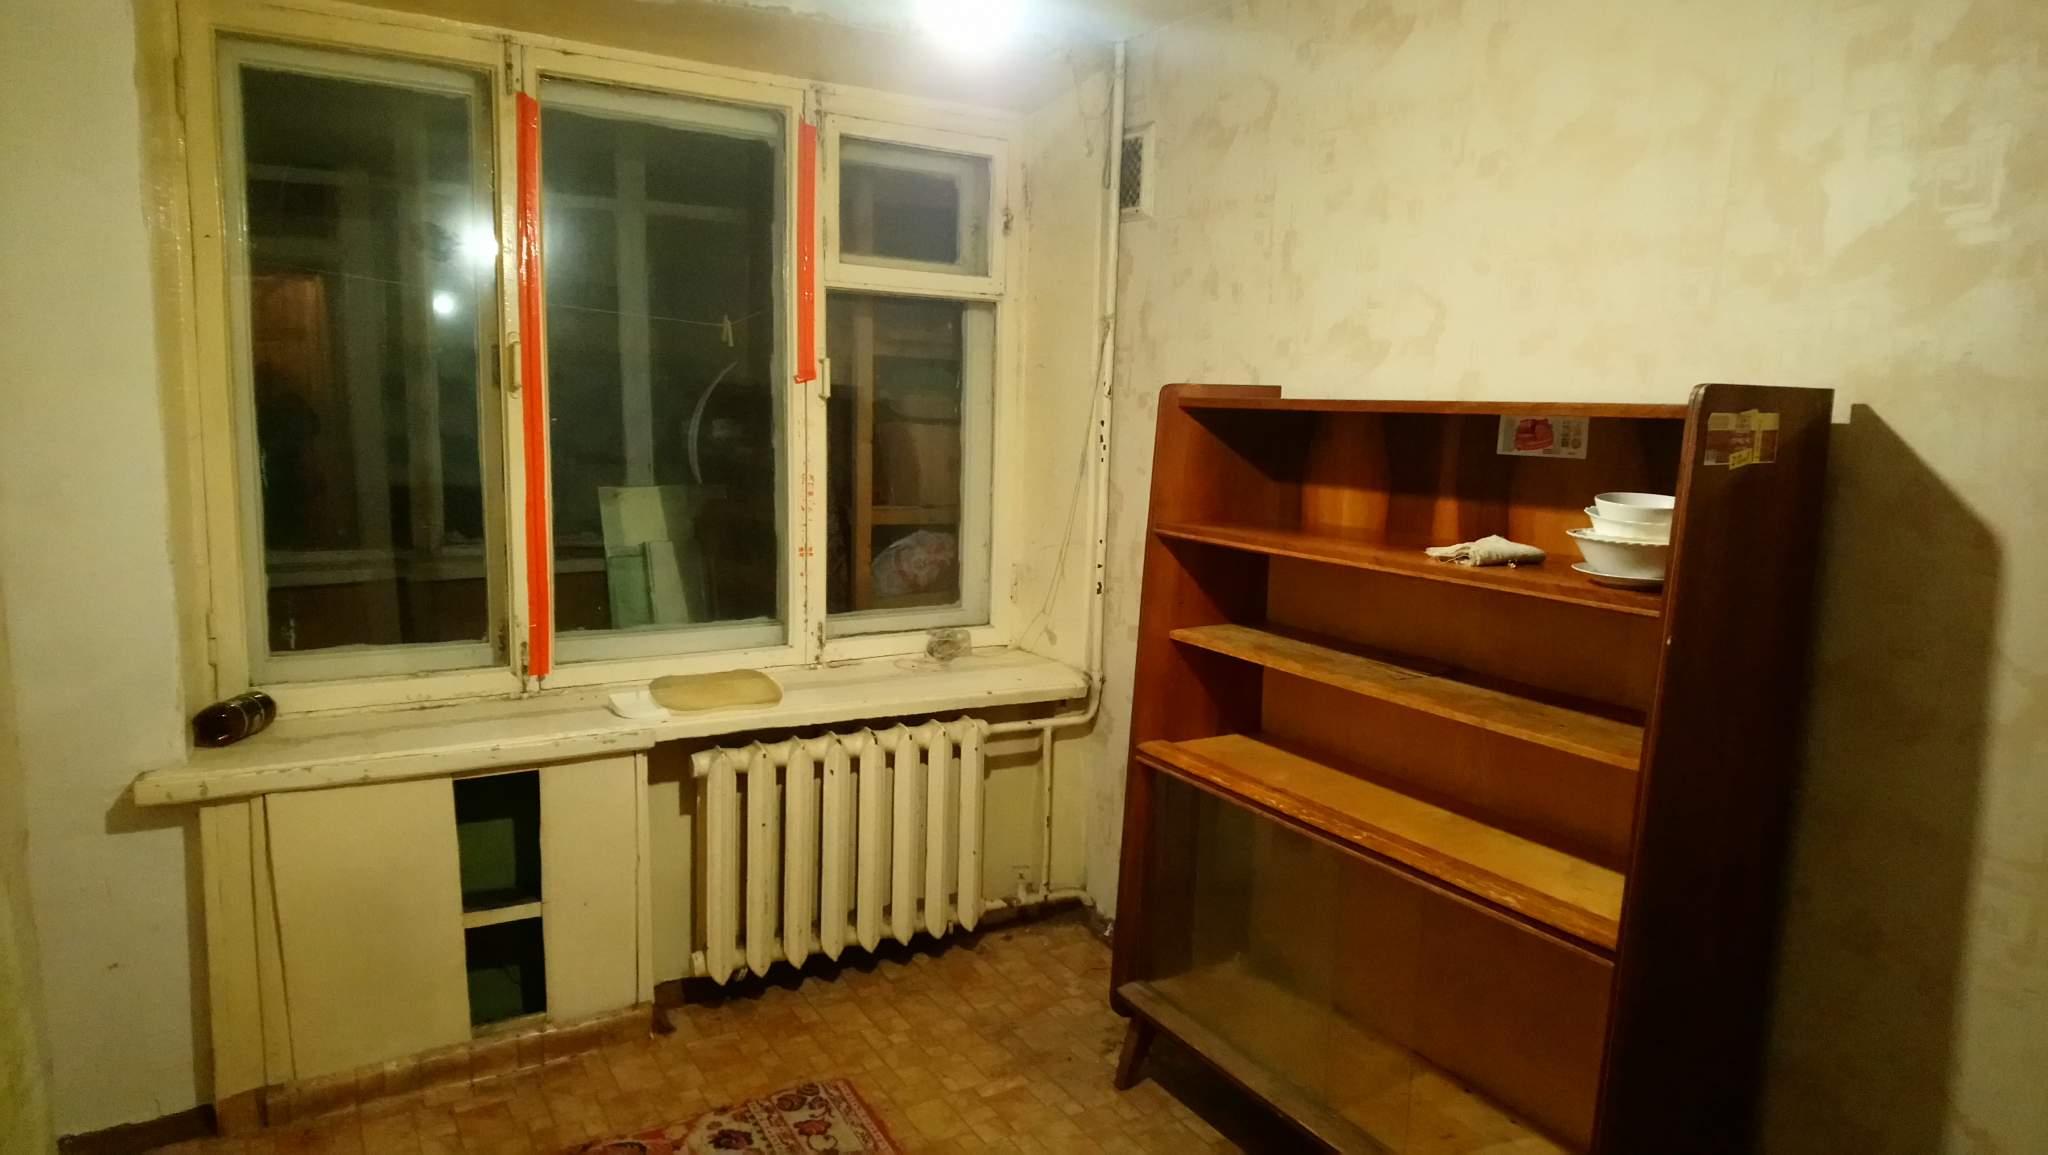 Квартира на продажу по адресу Россия, Самарская обл, Самара, Аэродромная улица, 91